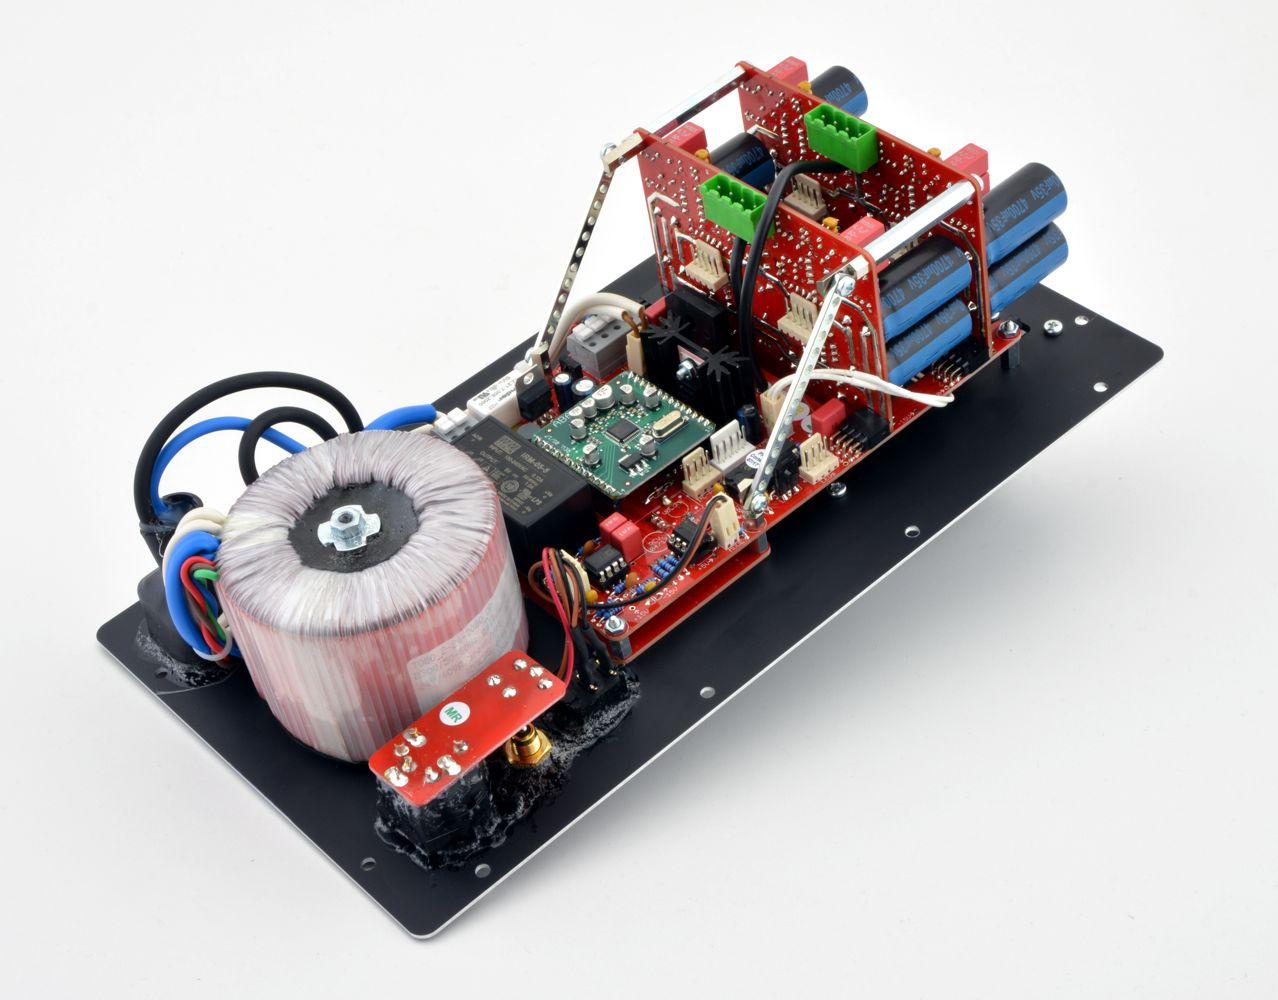 Elektronikrückwand der Cortex - 4-Kanal-Version